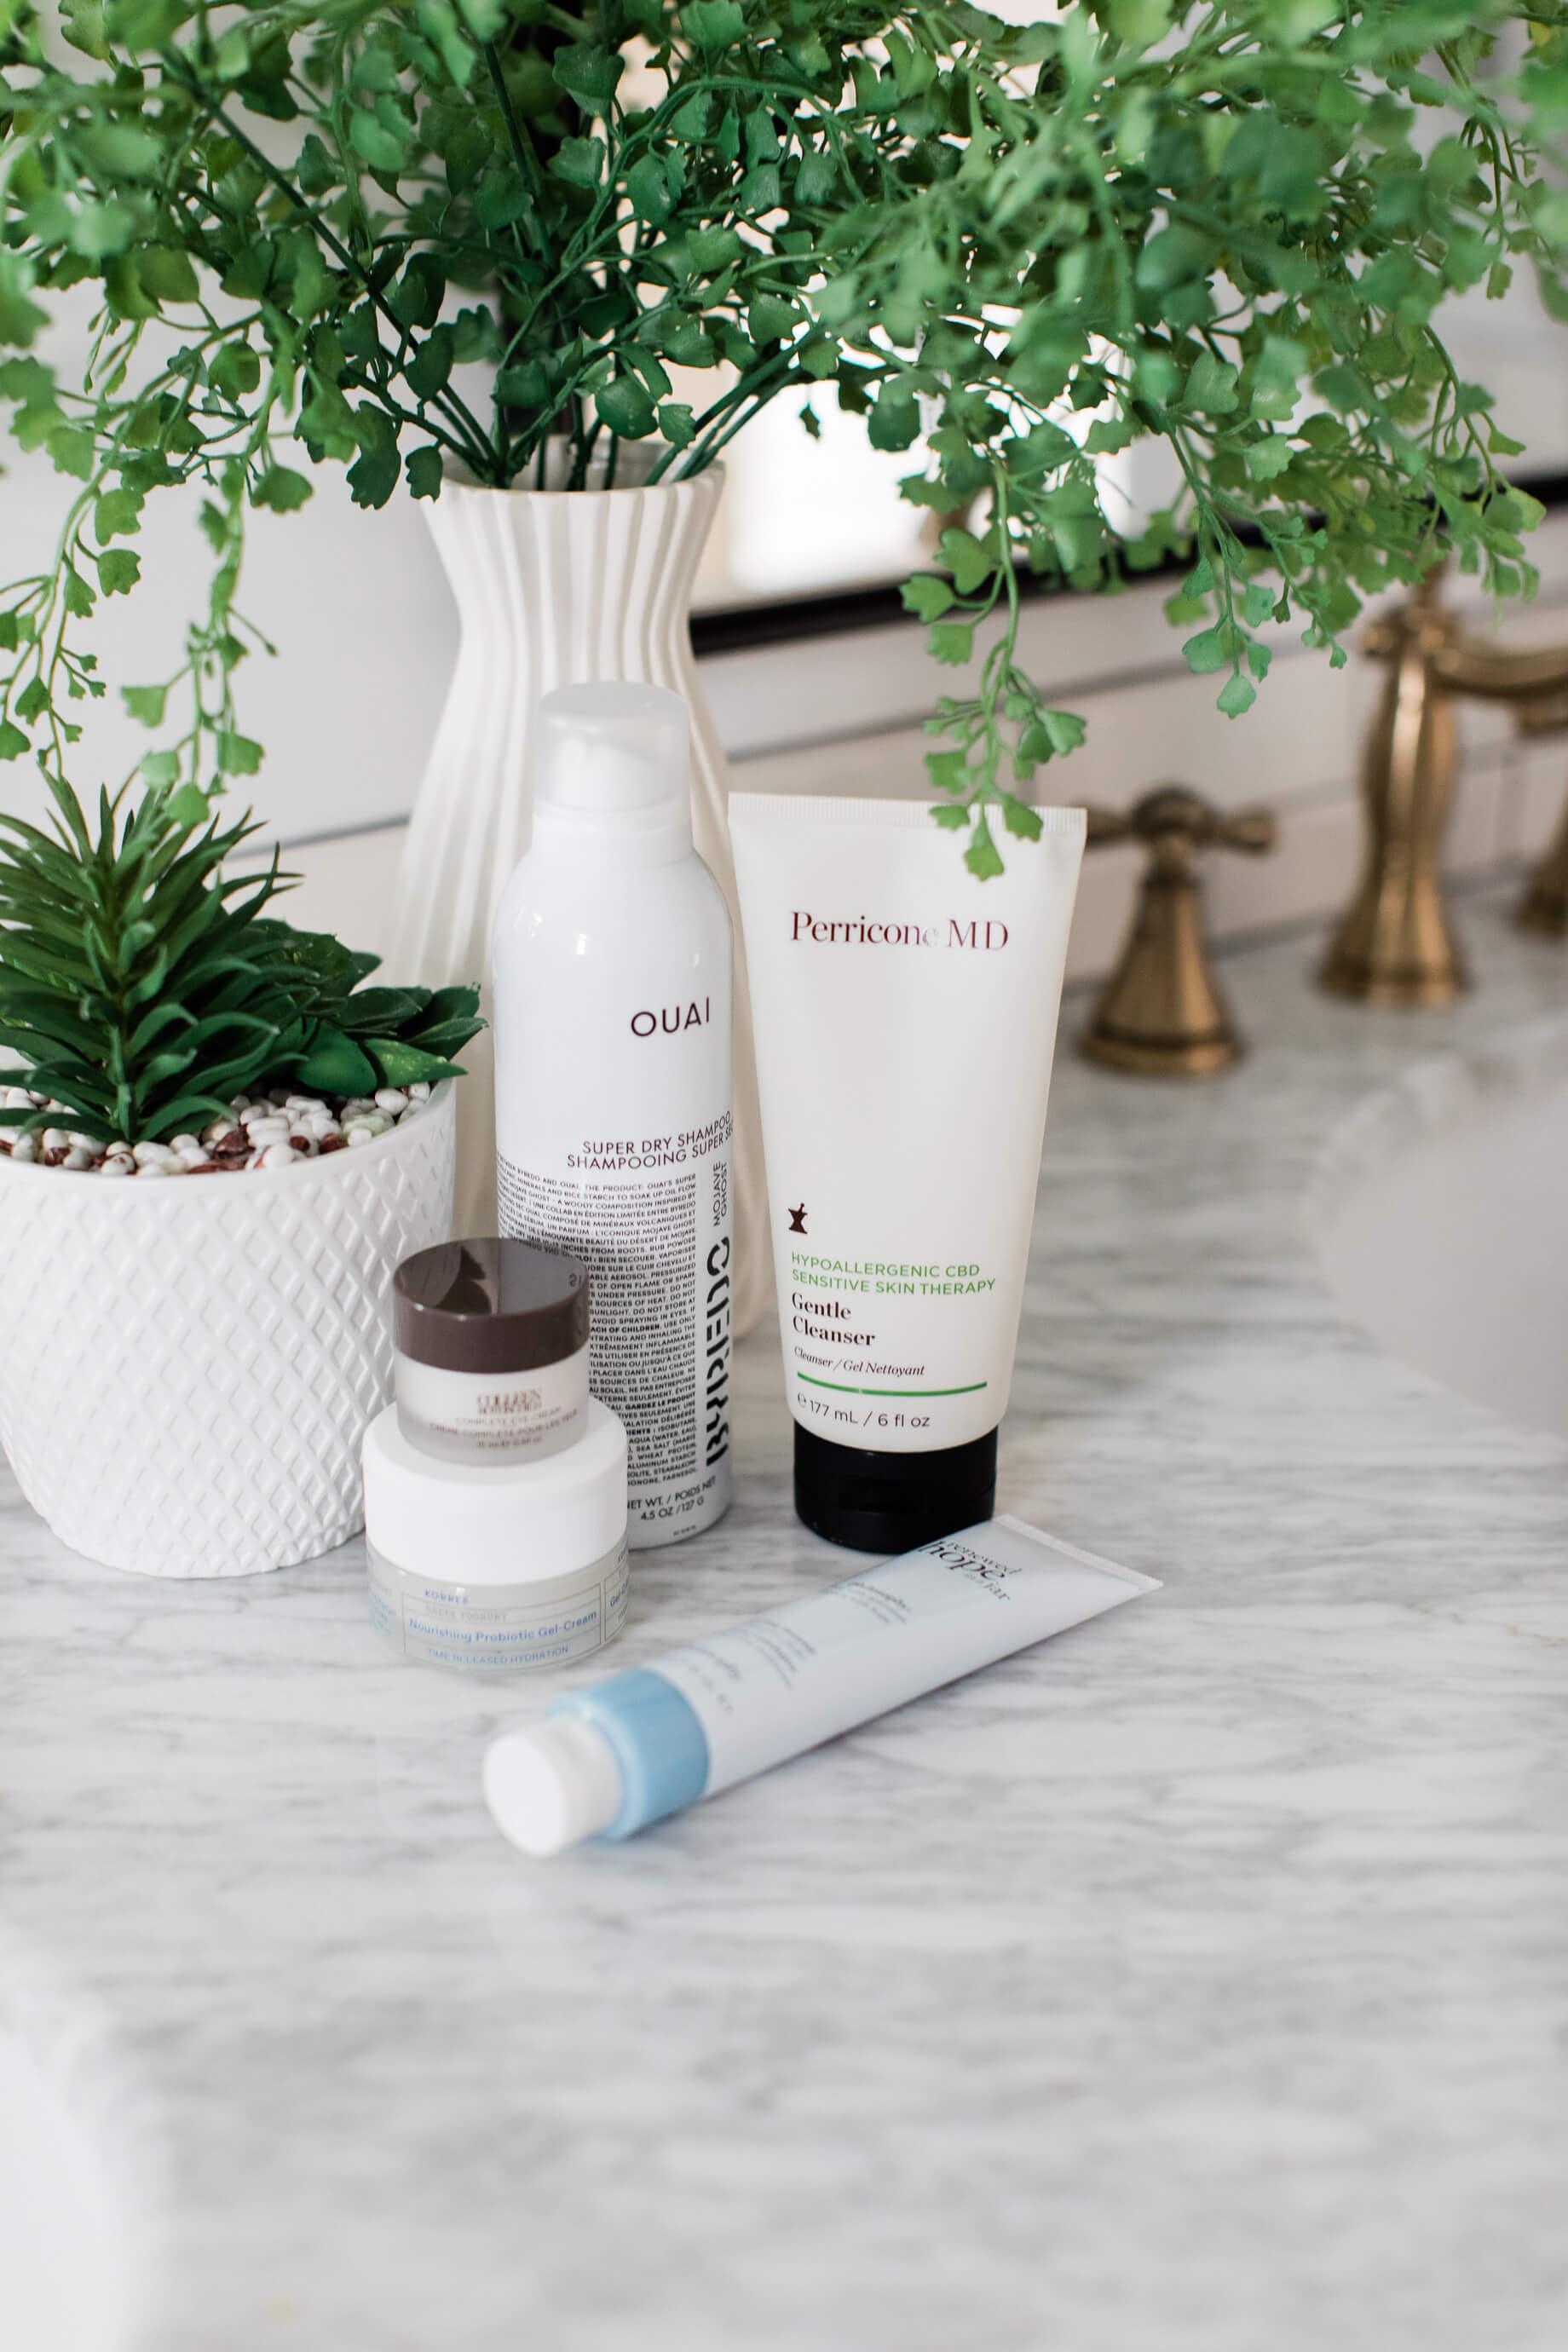 September's Beauty Reviews: Beauty Essentials